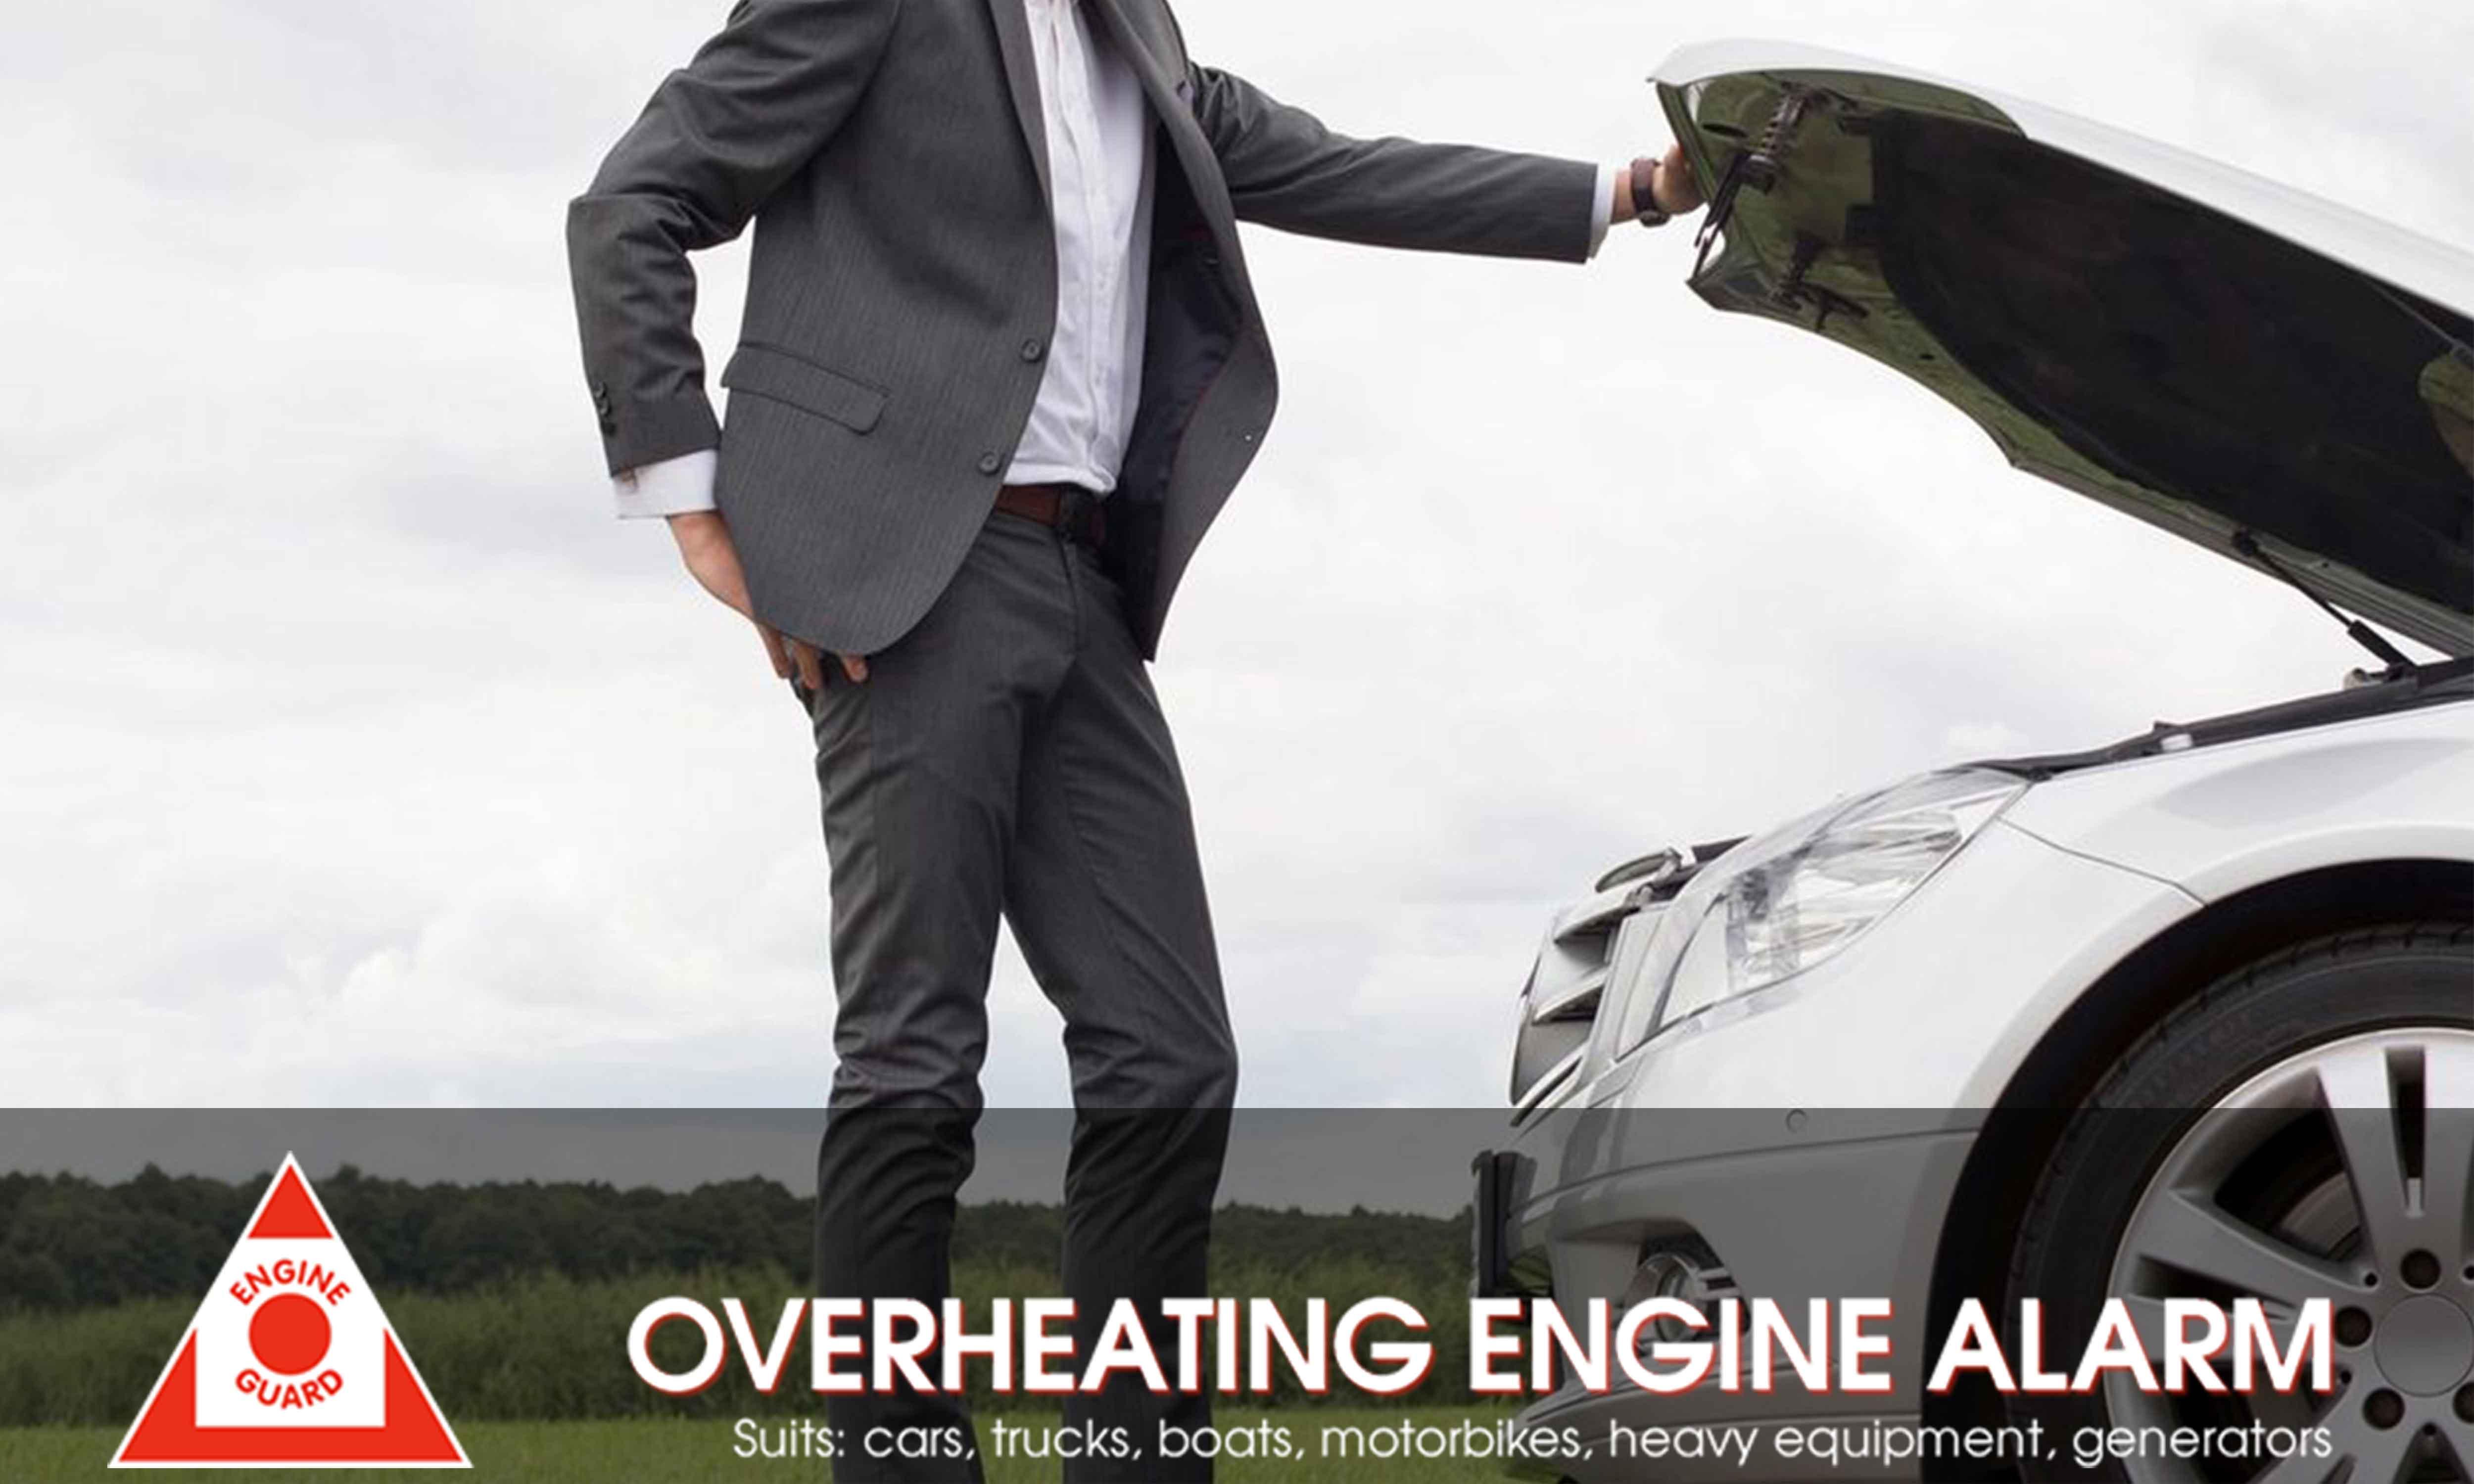 CAR OVERHEATING ALARM with DIGITAL DISPLAY Engine Guard EG01//1 BOLT-ON SENSOR